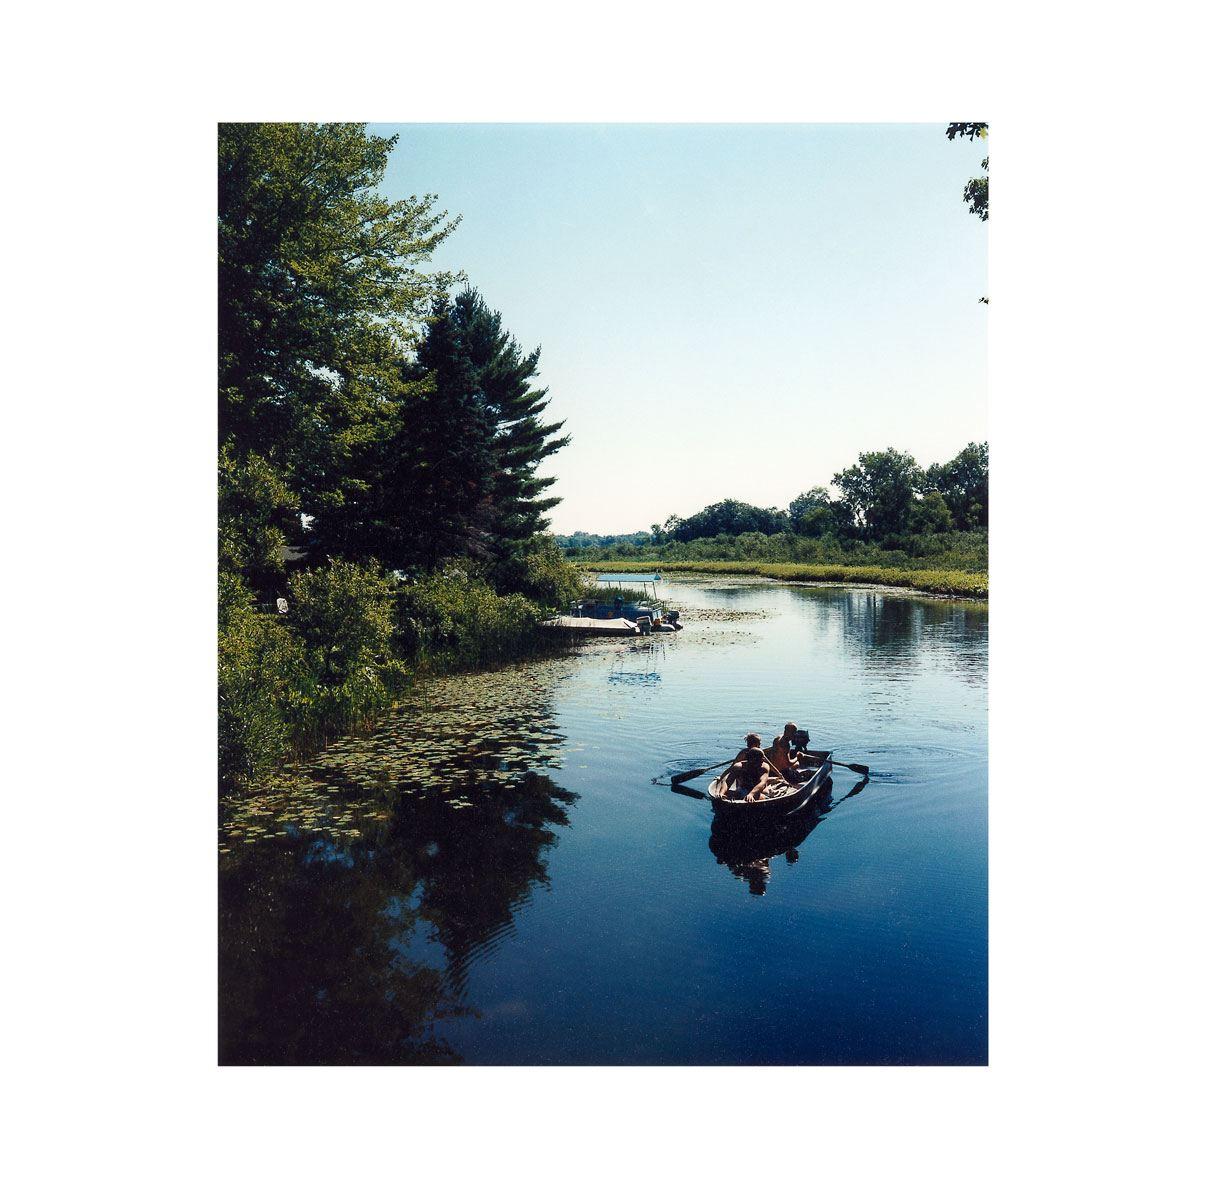 """Rowing"" | Village Portrait | Pentwater, Michigan, USA | 1996"